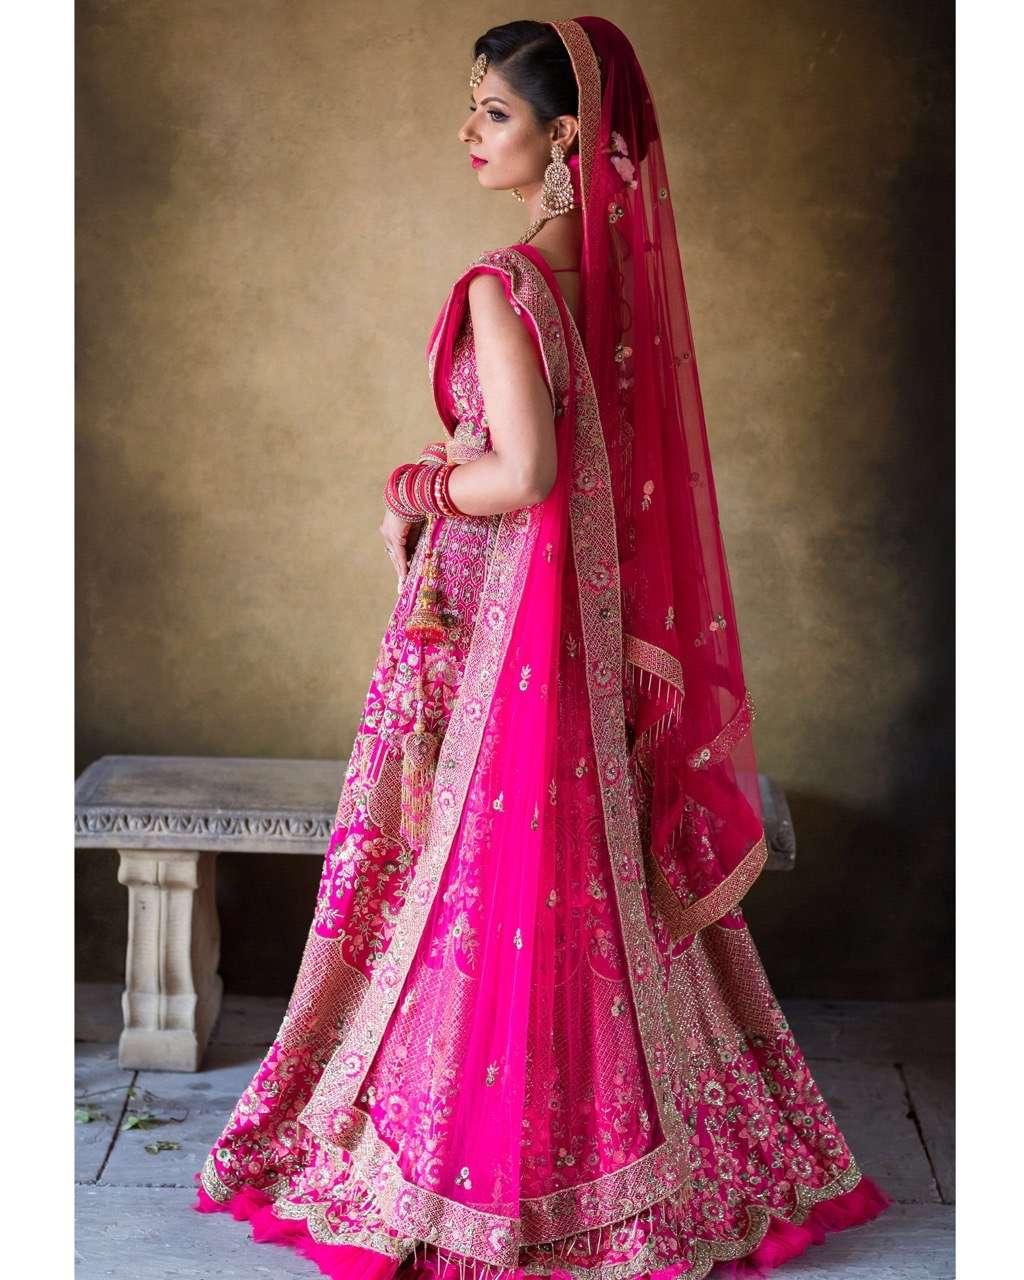 Rakhee found her wedding dress on Instagram!